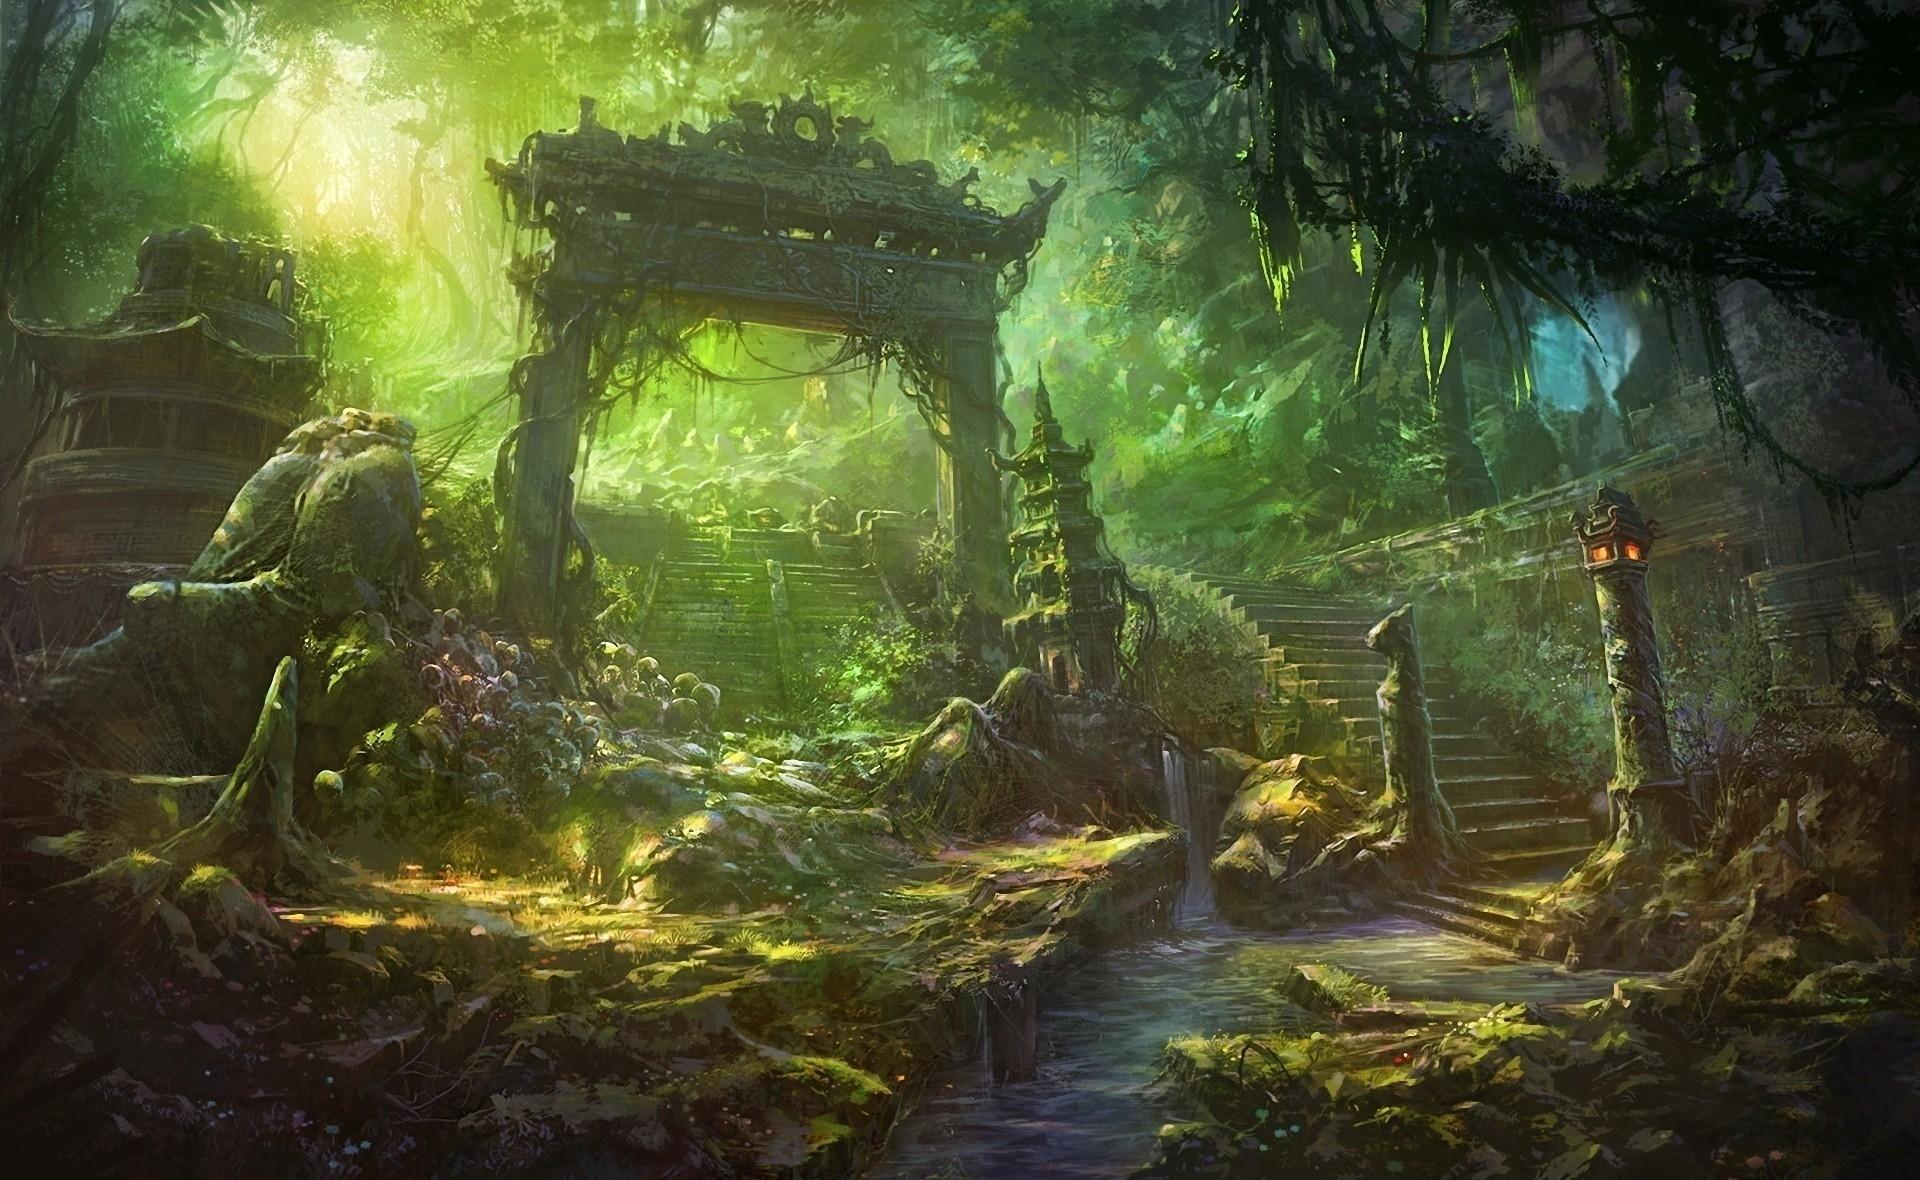 Fantasy Forest Landscape Cool Wallpapers